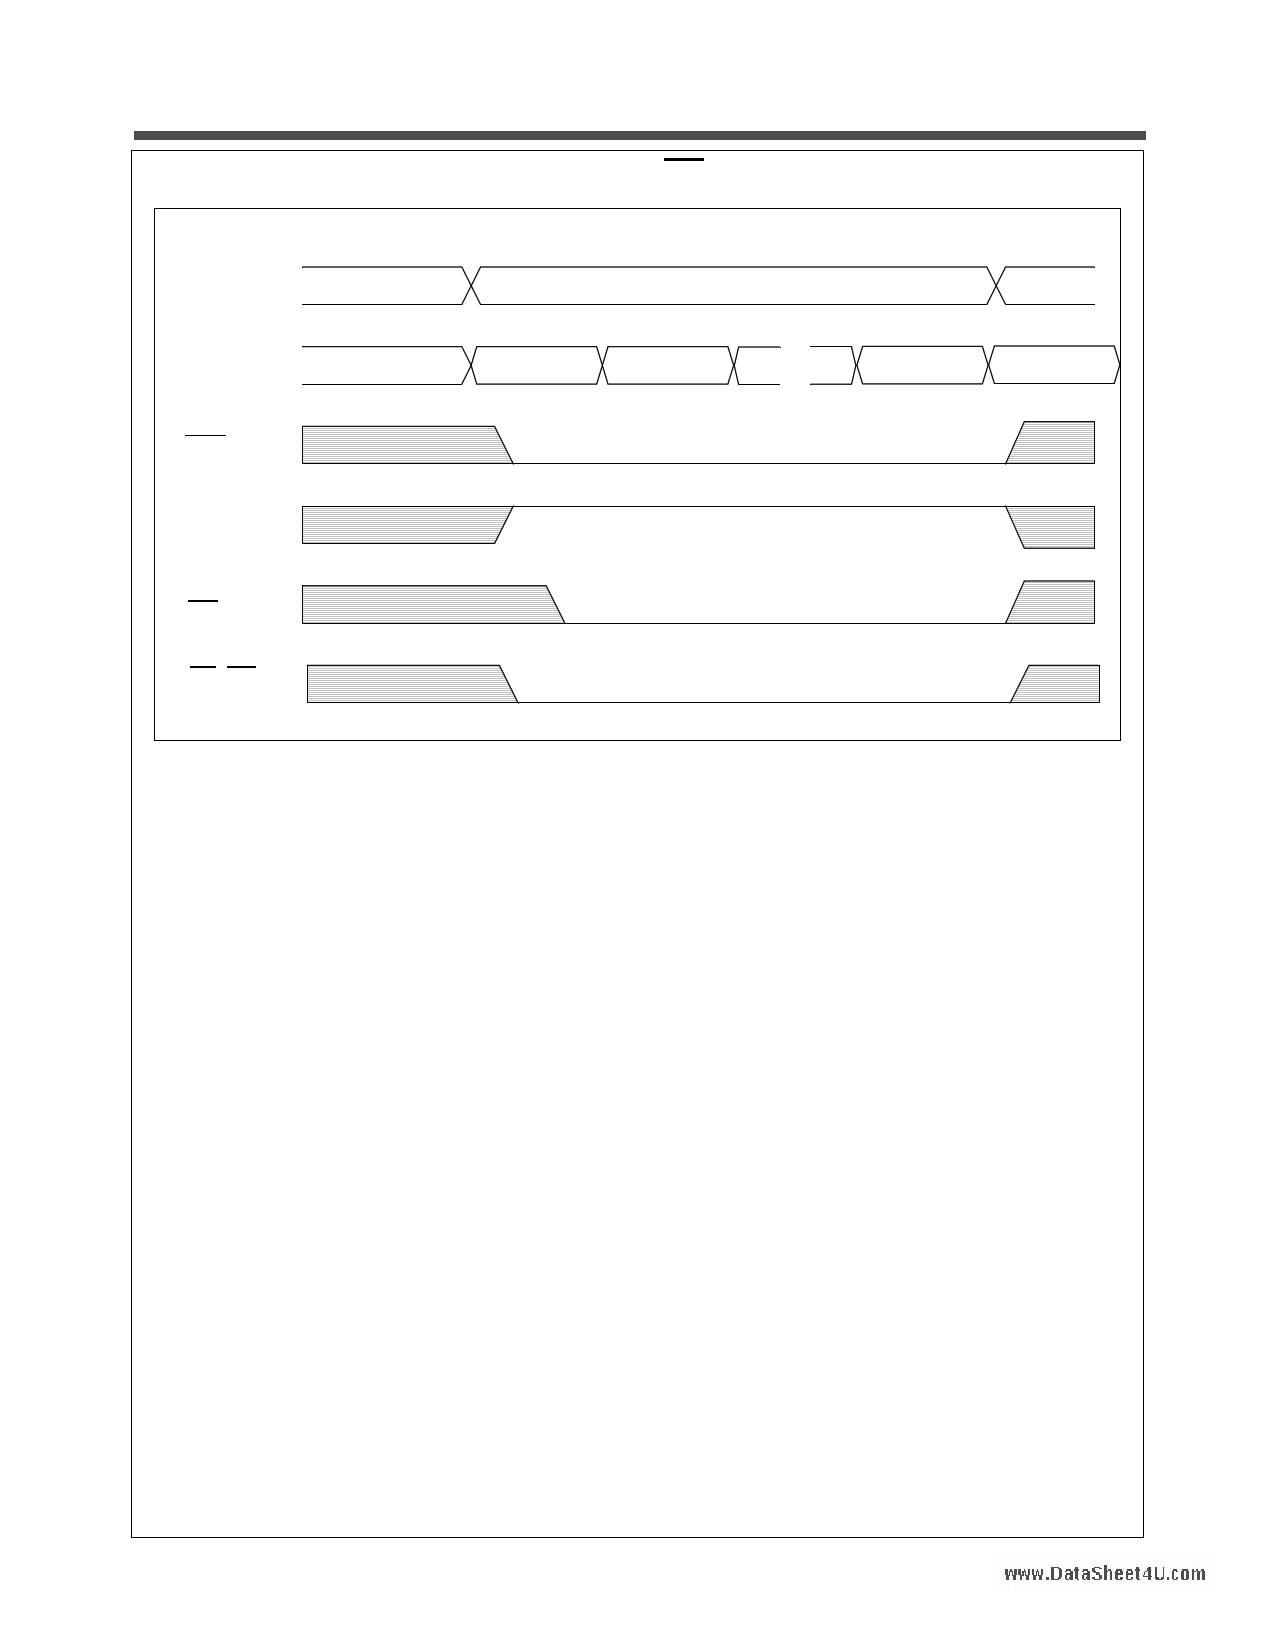 N02L163WC2A pdf, arduino